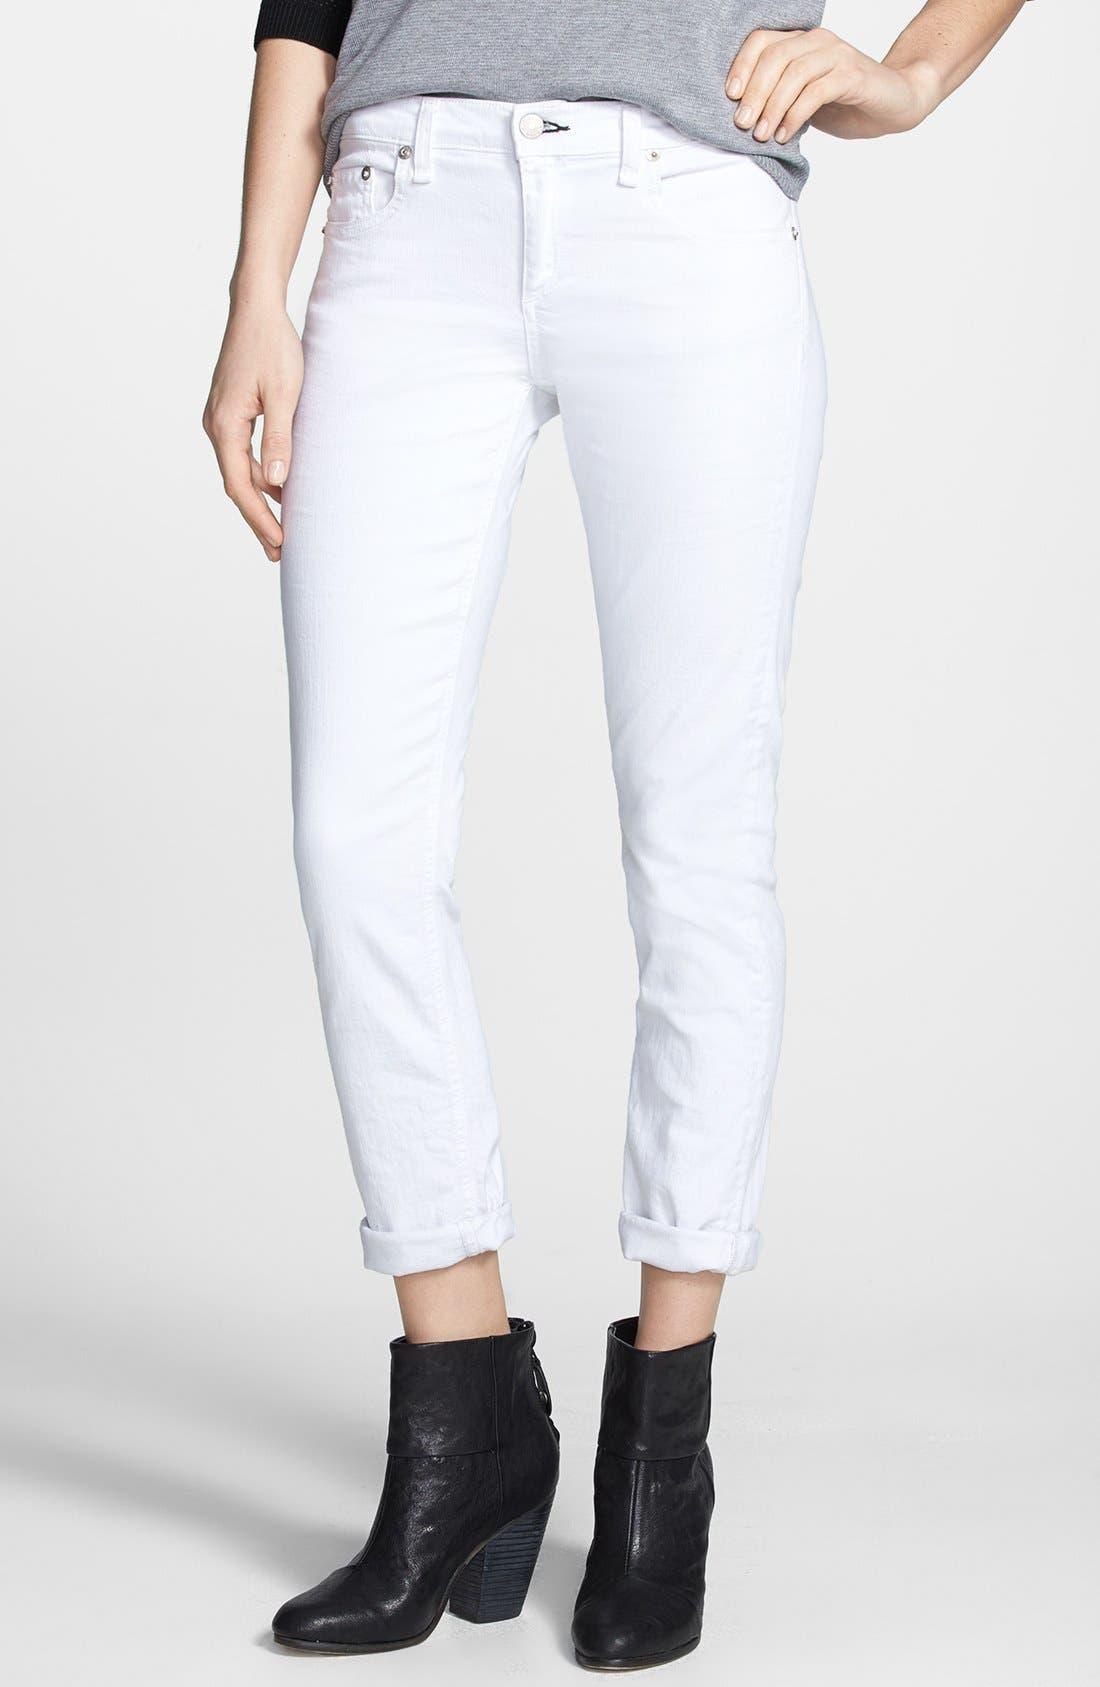 'The Dre' Skinny Jeans,                             Main thumbnail 1, color,                             BRIGHT WHITE